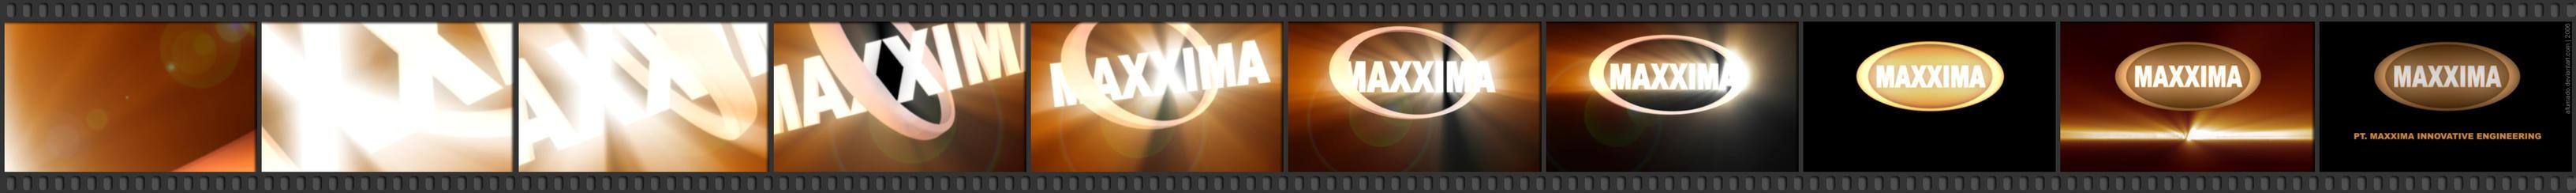 Maxxima Logo Bumper by afumado